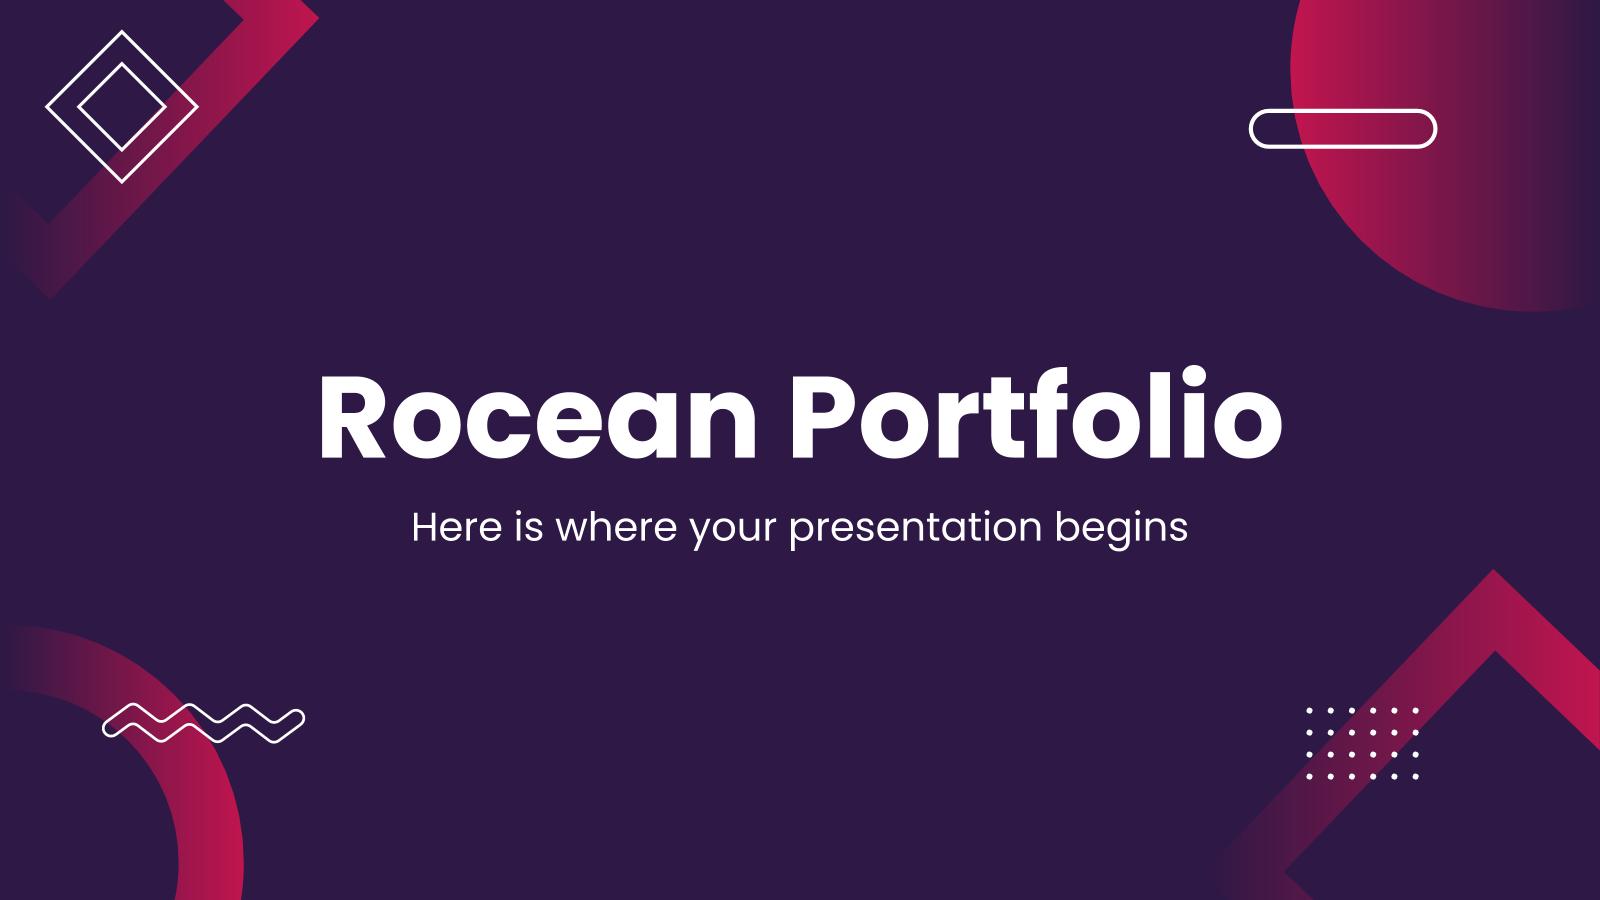 Rocean Portfolio presentation template